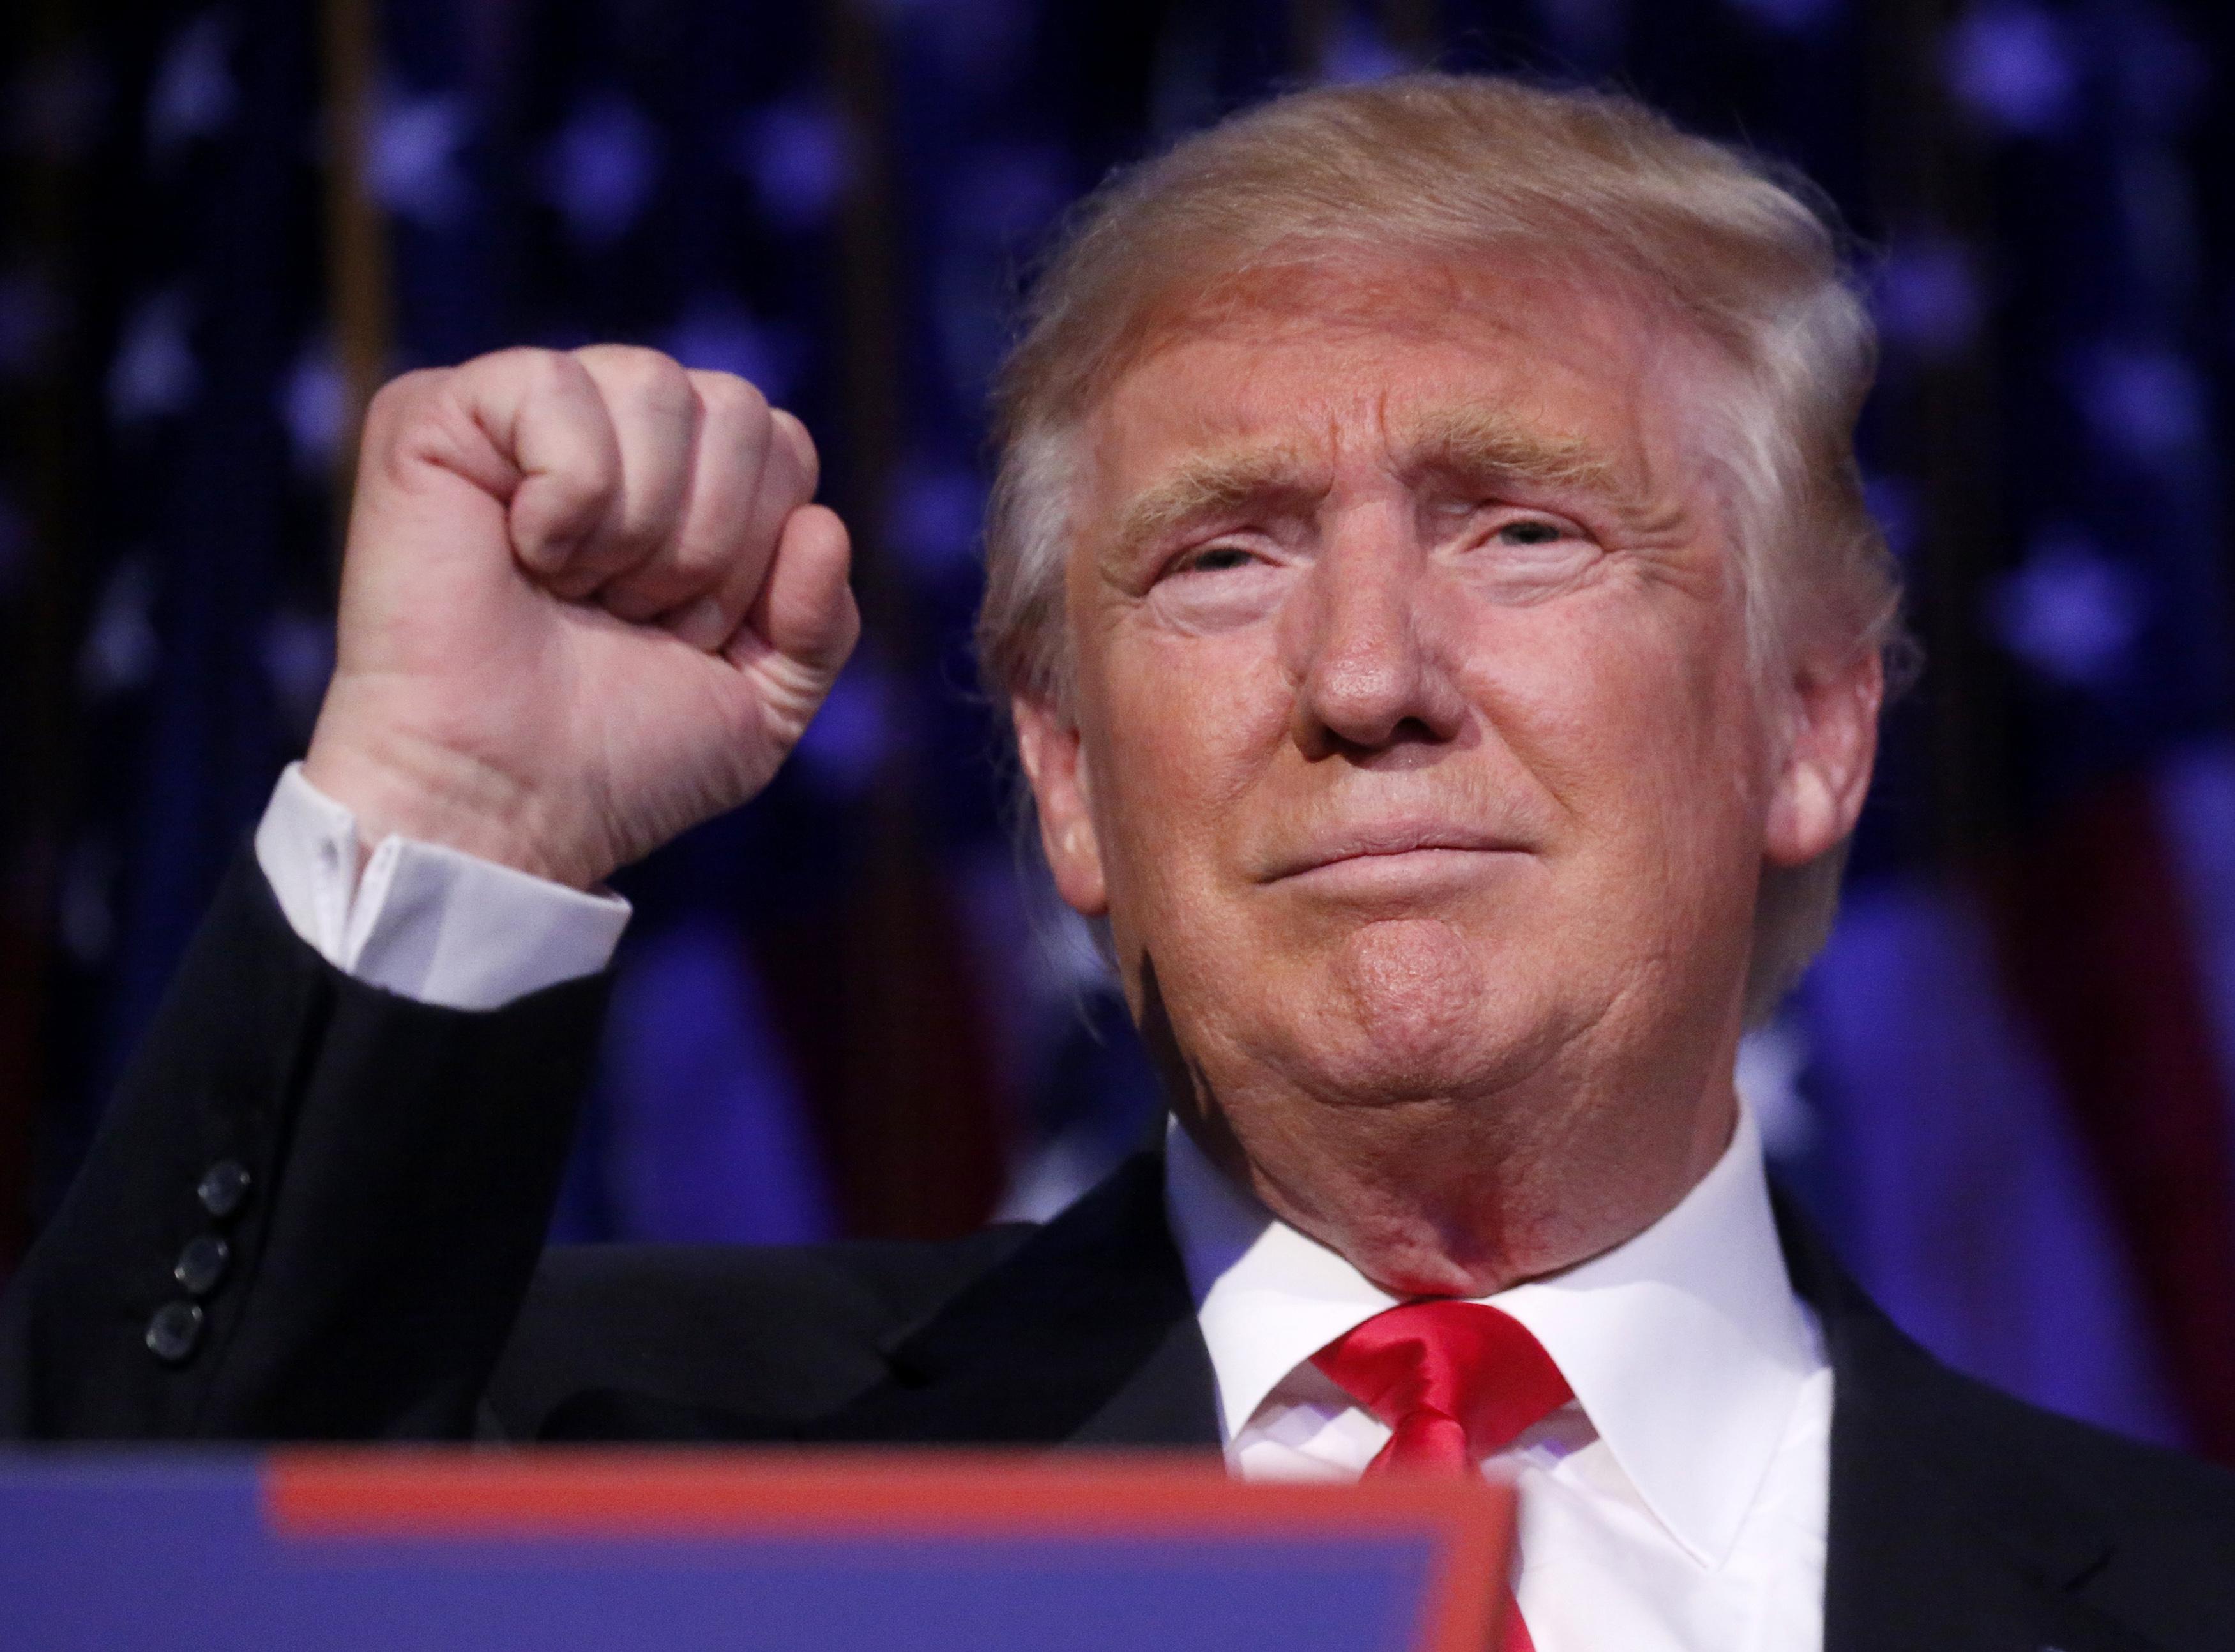 Republican U.S. presidential nominee Donald Trump speaks at his election night rally in Manhattan, New York, U.S., November 9, 2016. REUTERS/Carlo Allegri  - RTX2SPZ8